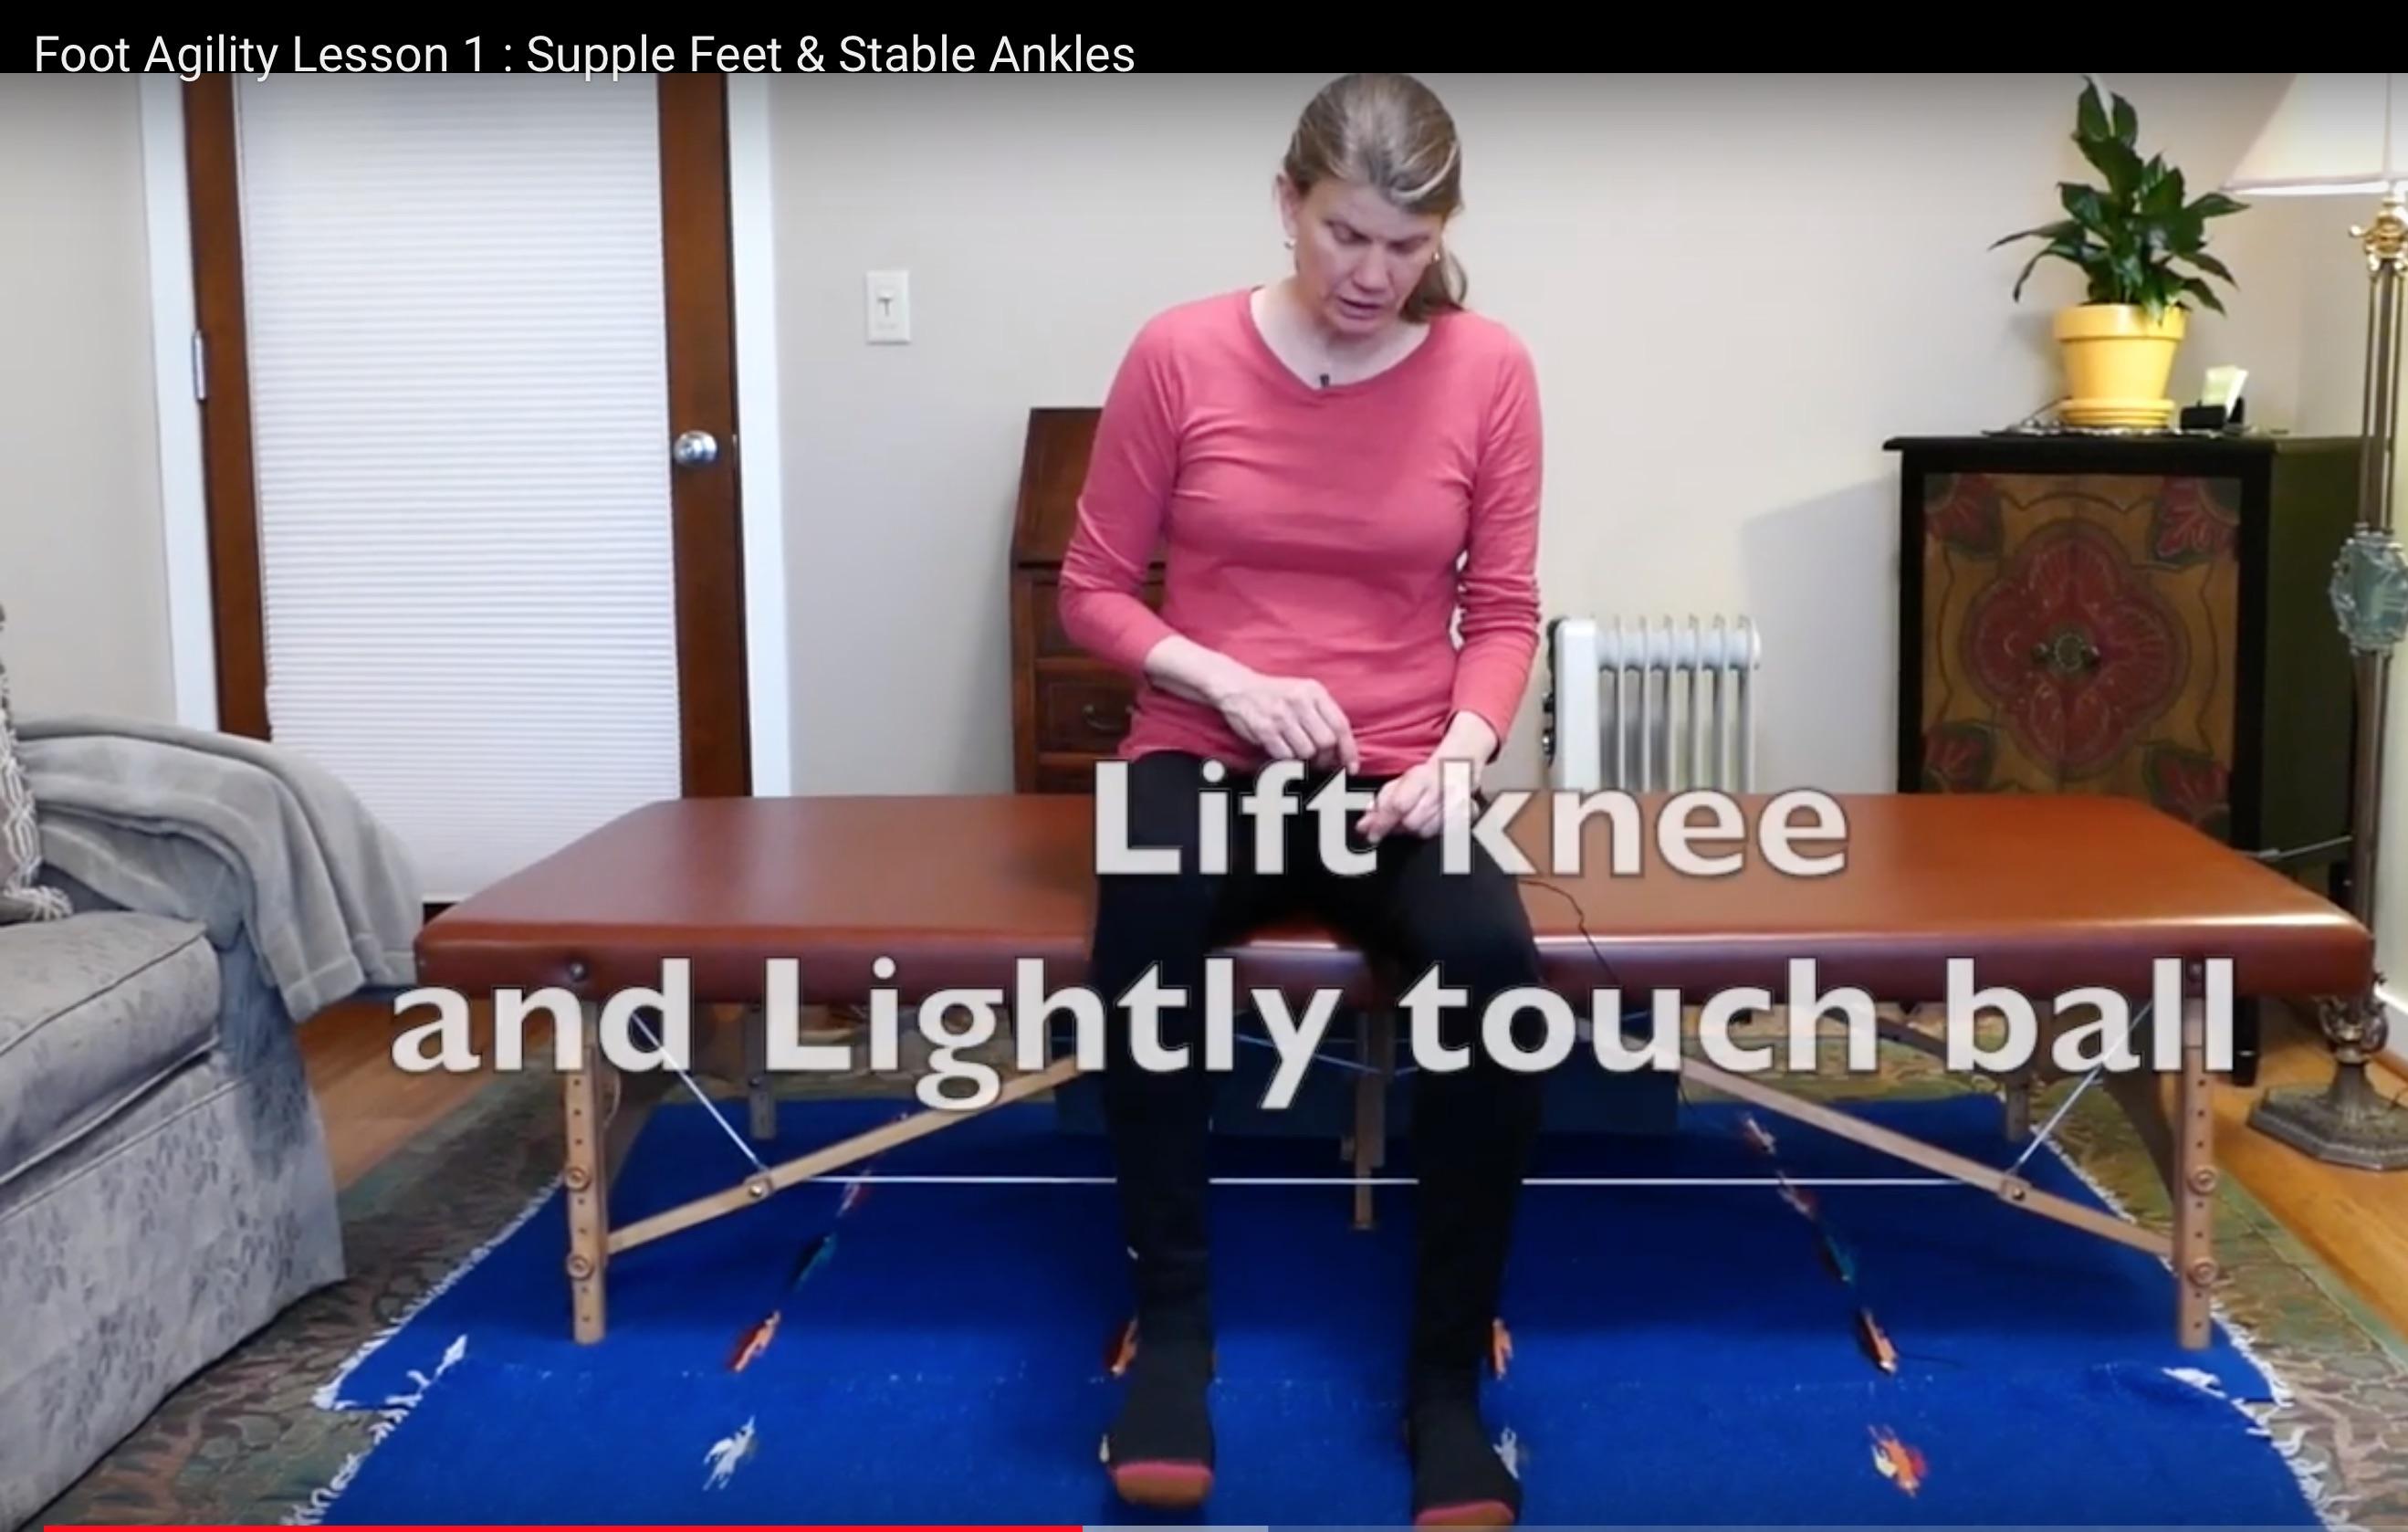 Foot Agility Lesson 1